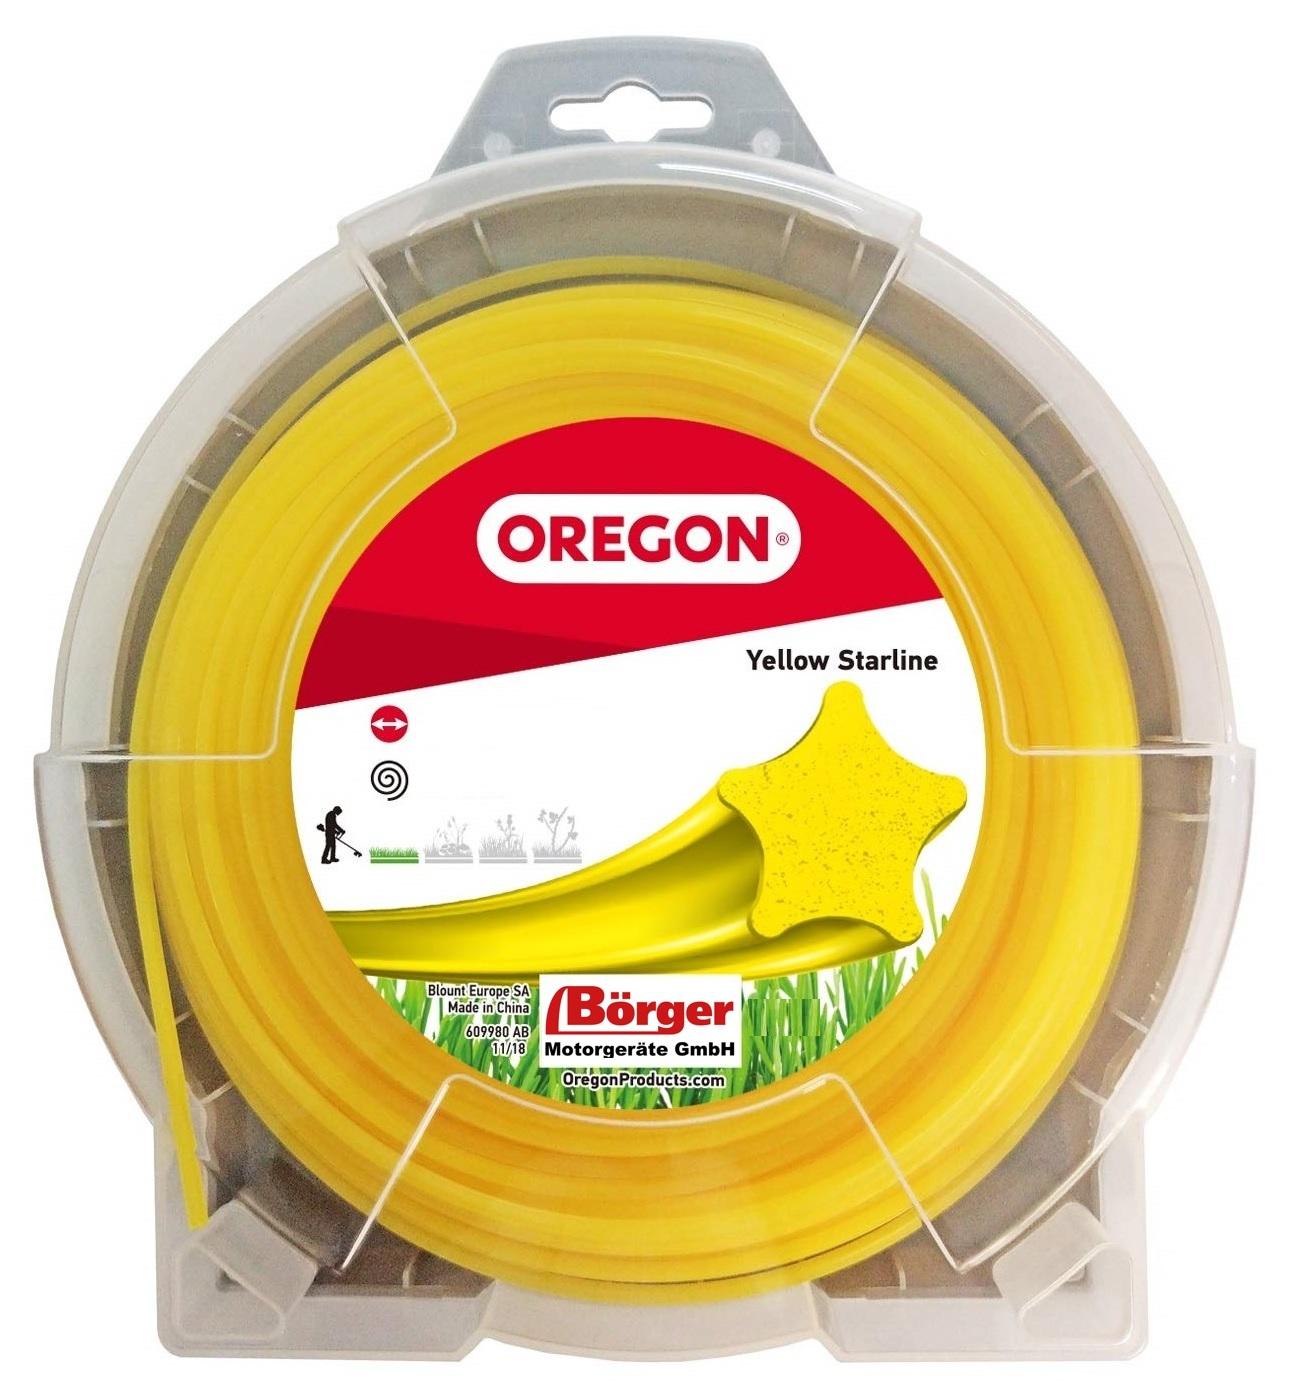 Oregon_Yellow_Starline_Blister.jpg